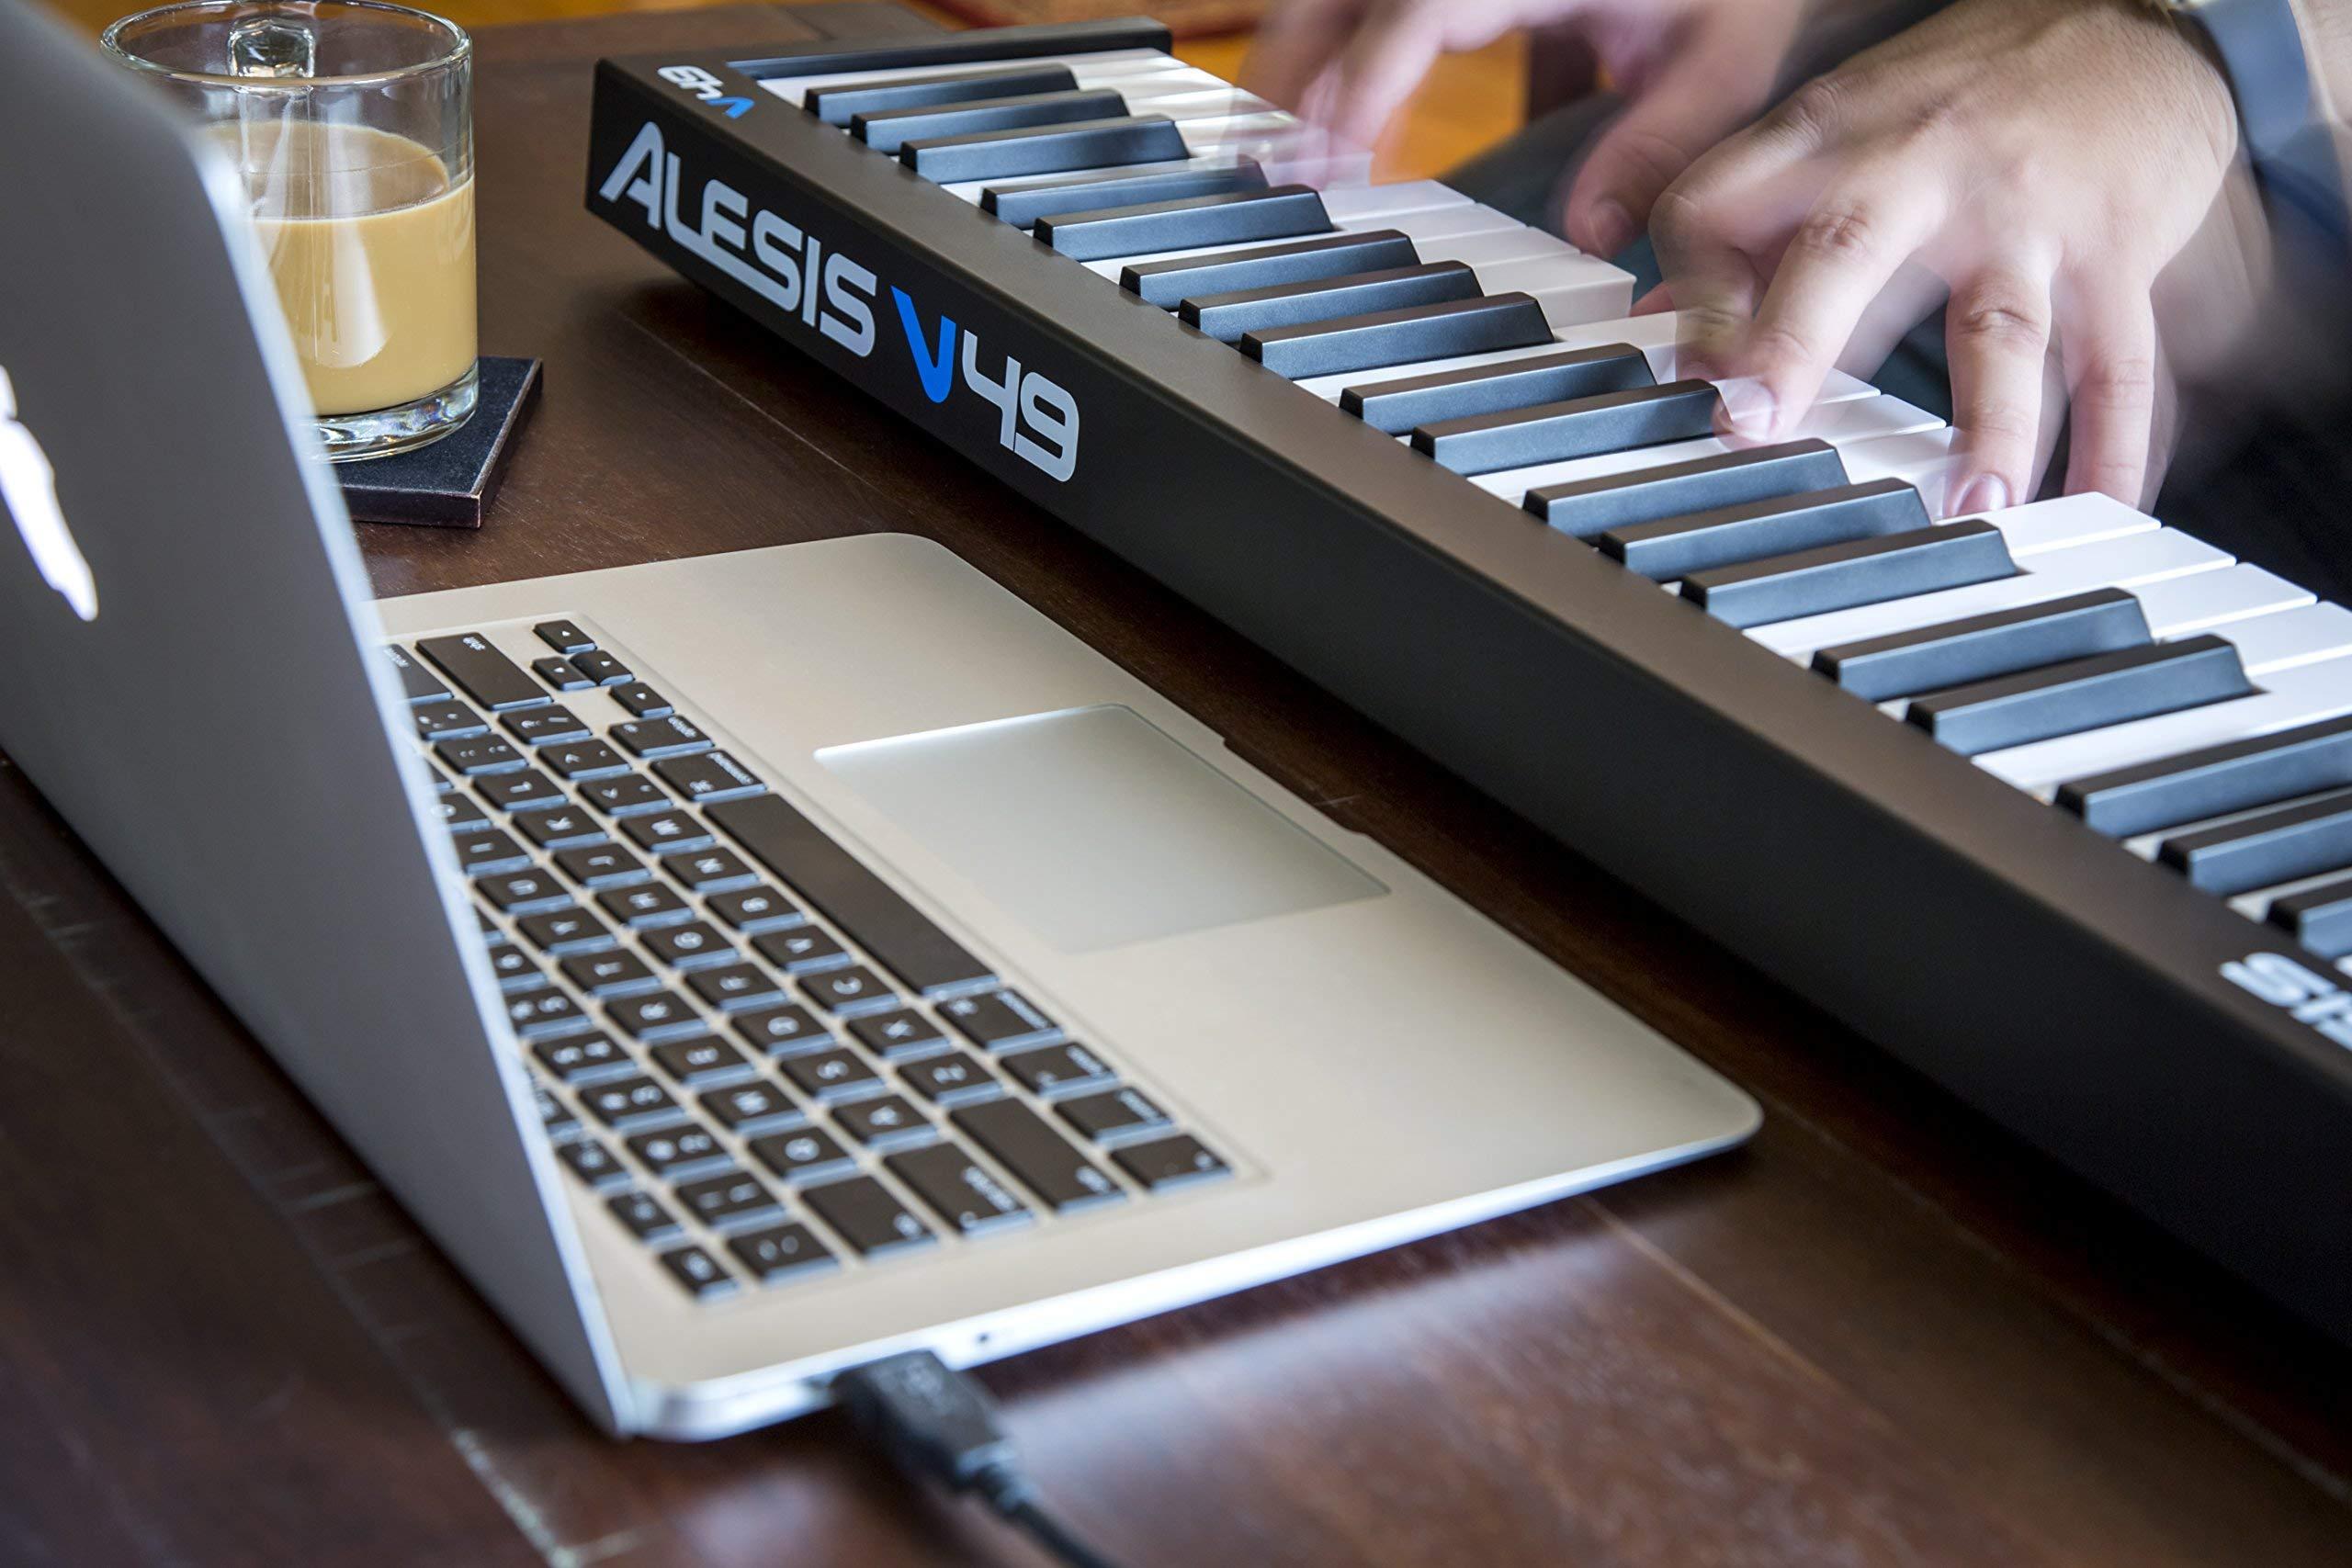 Alesis V49   49-Key USB MIDI Keyboard & Drum Pad Controller (8 Pads / 4 Knobs / 4 Buttons) (Renewed)